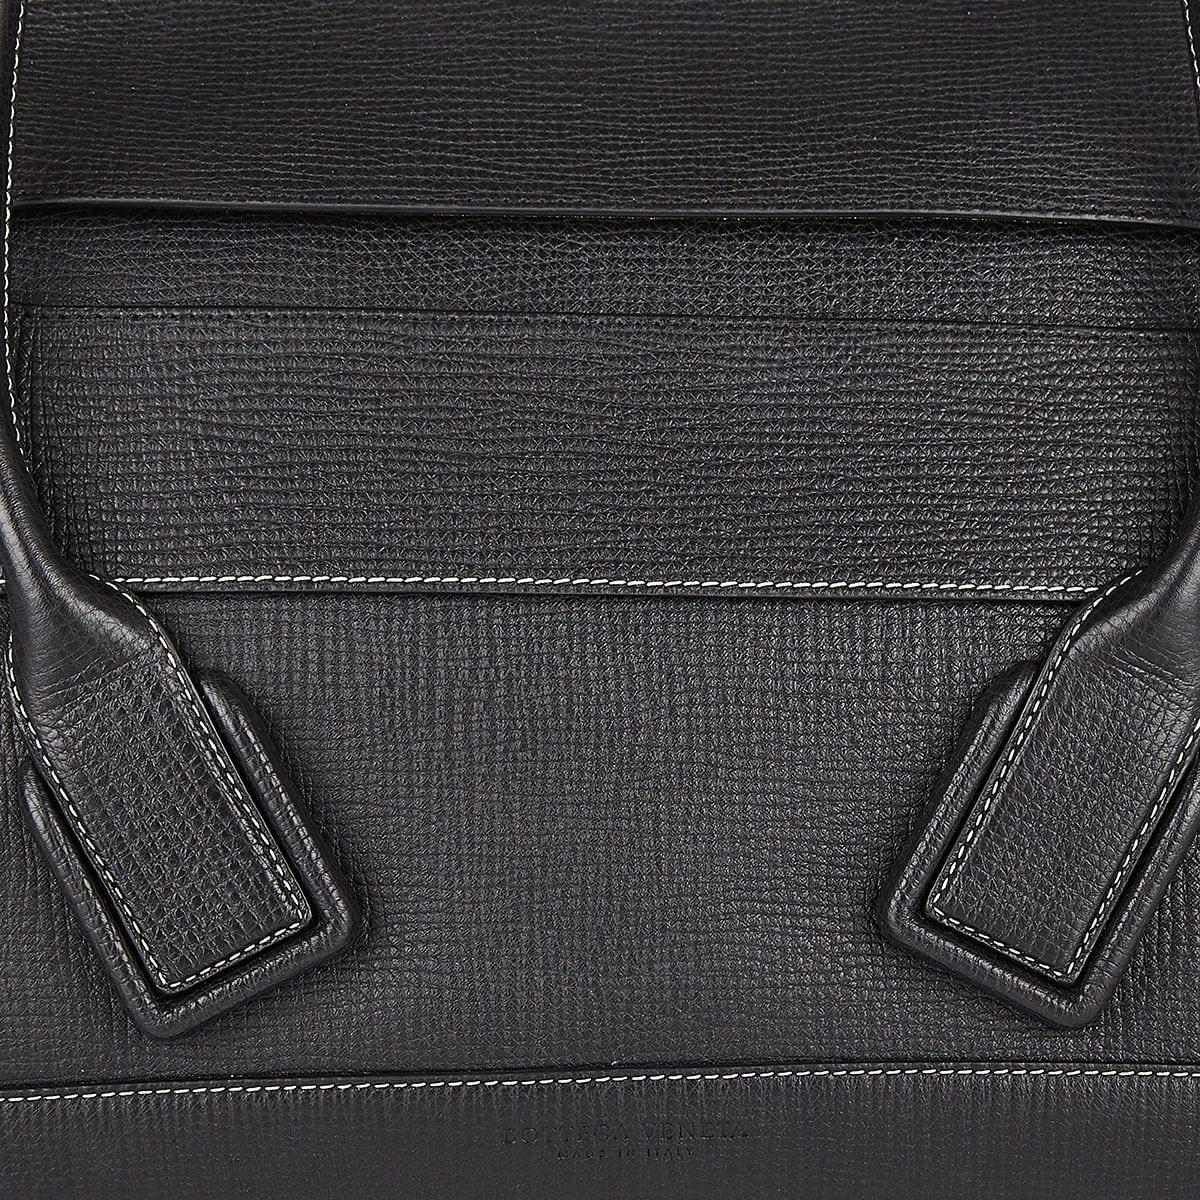 Arco 48 medium leather bag